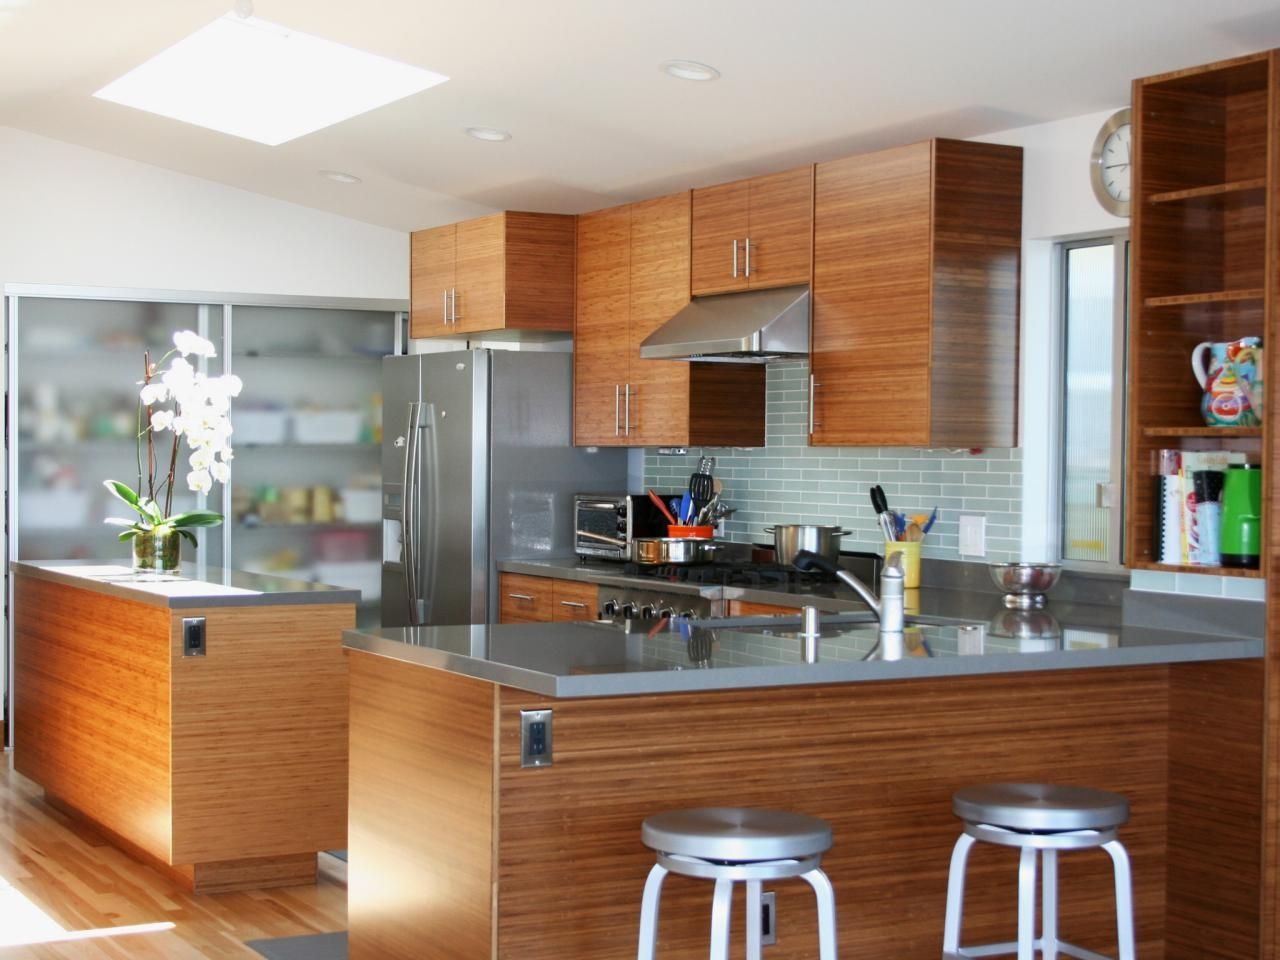 Mid Century Modern Kitchen With Sea Green Glass Tile Backsplash